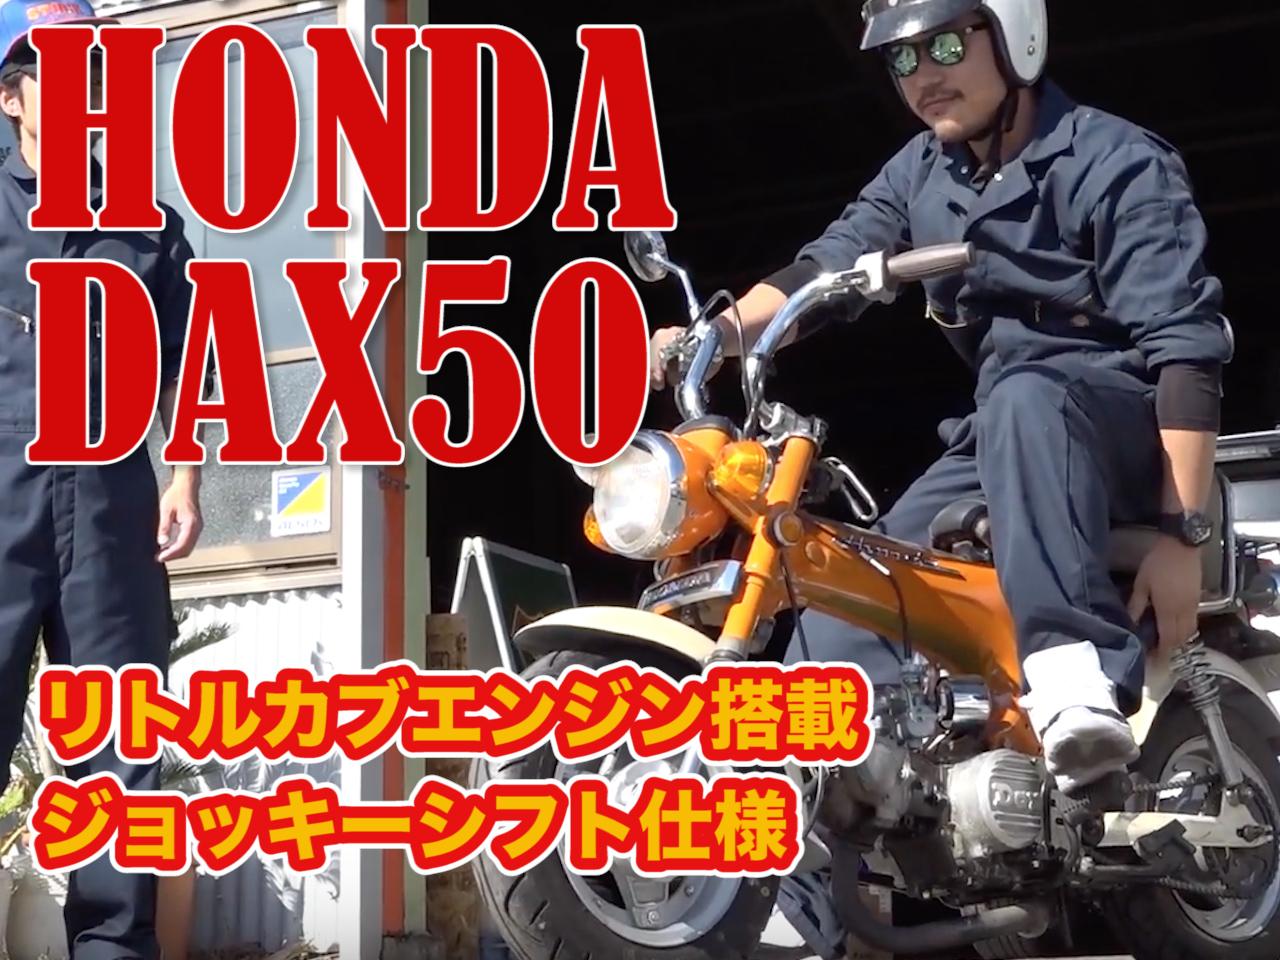 dax50 HONDA ちょんまげガレージ